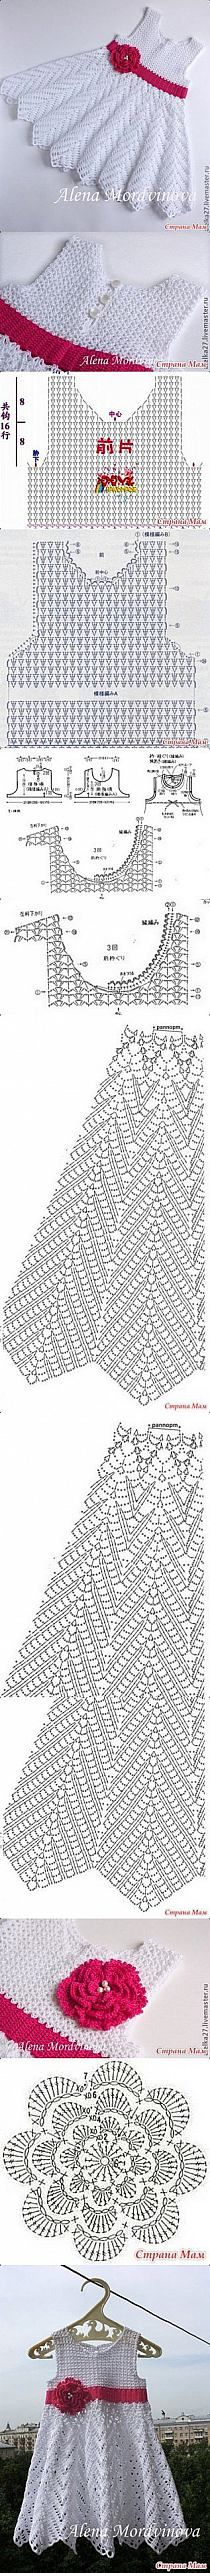 "z ""pl - Odkrywaj, kolekcjonuj, inspiruj /diagram pattern / this is so cute!"", ""Diagram for pretty baby dress."", ""Discover thousands of images about J Crochet Baby Clothes, Crochet Girls, Crochet For Kids, Baby Patterns, Dress Patterns, Knitting Patterns, Crochet Patterns, Crochet Poncho, Crochet Lace"